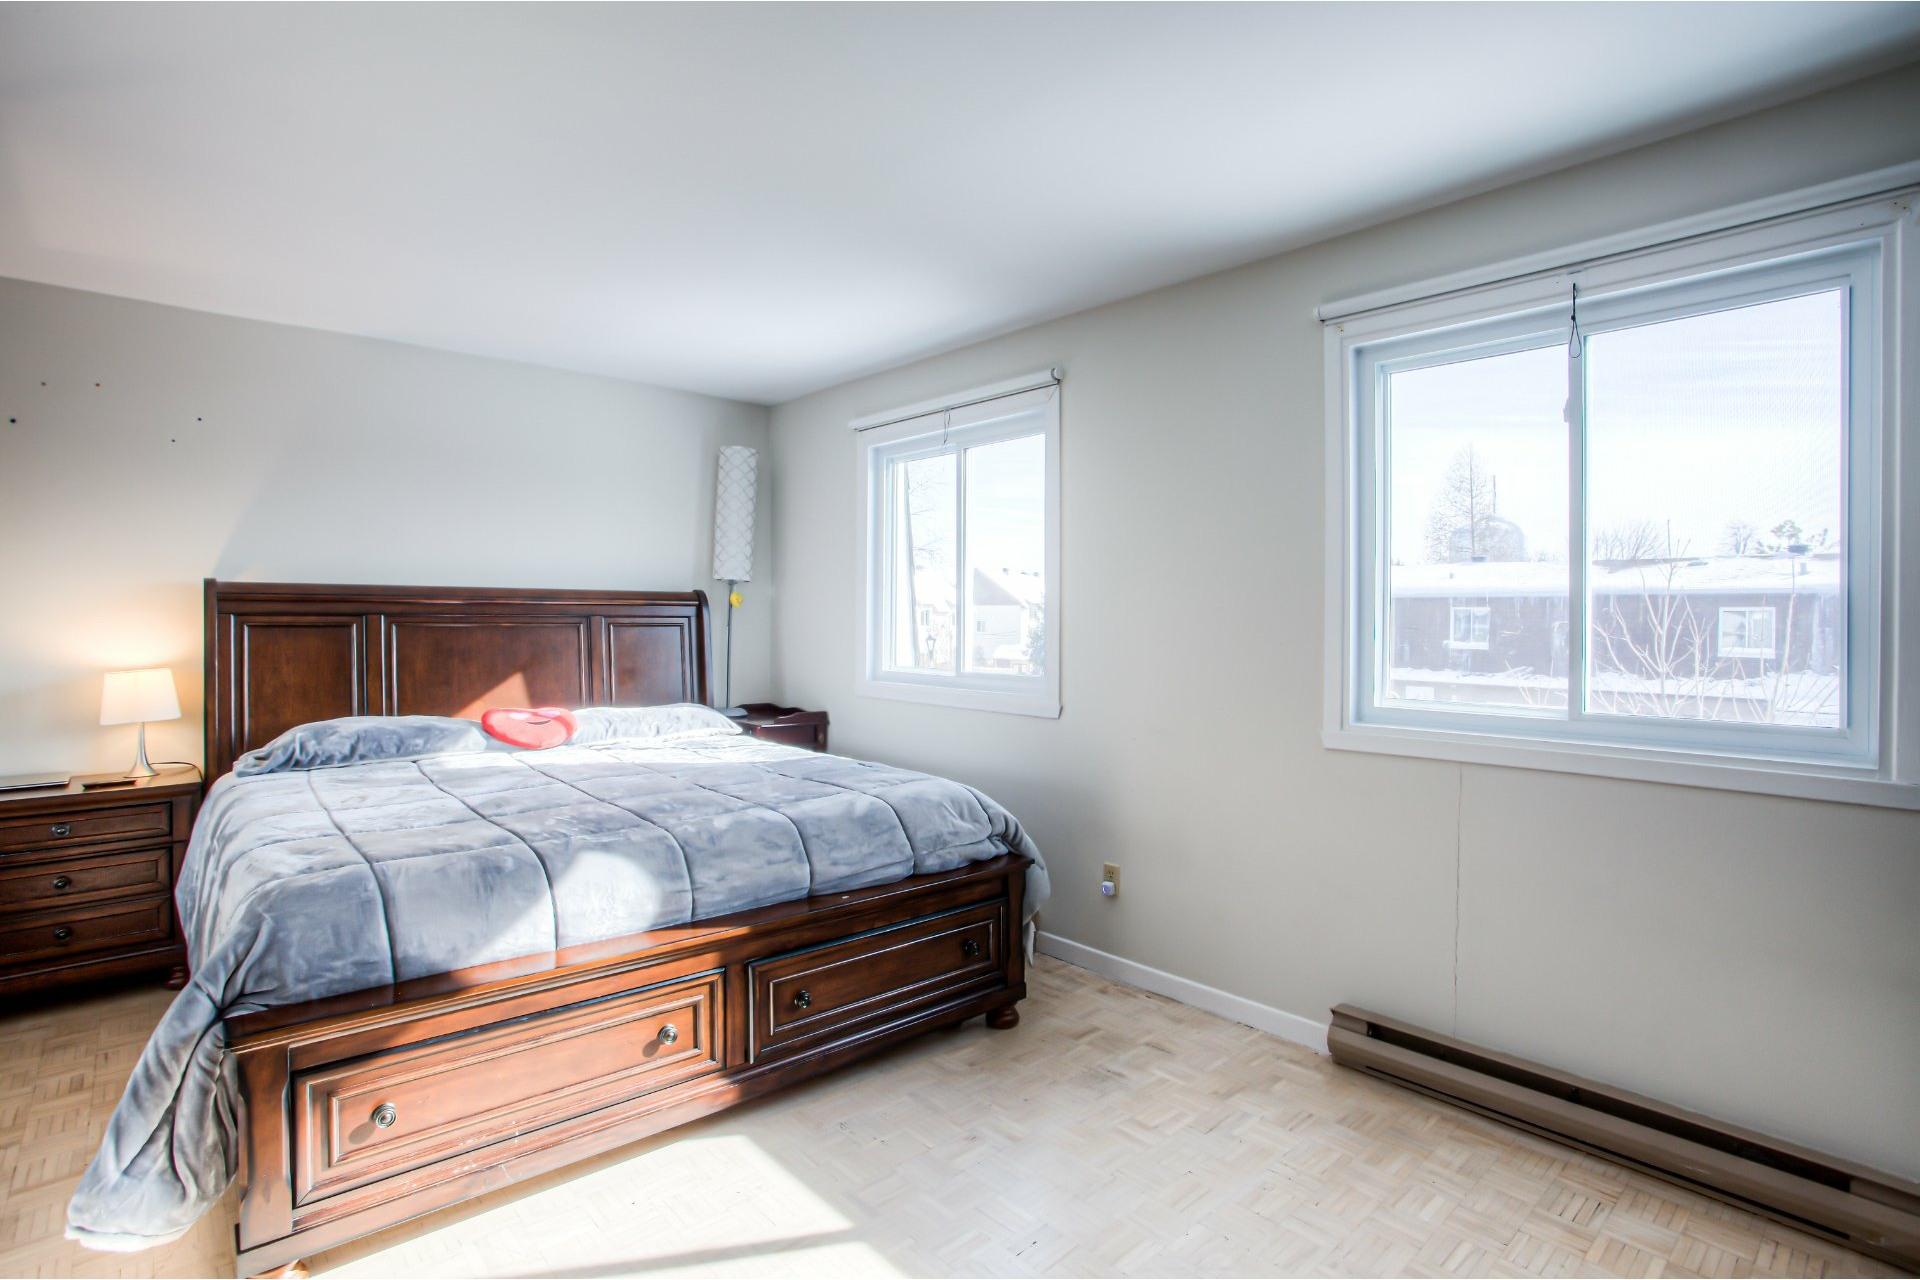 image 14 - House For rent Pierrefonds-Roxboro Montréal  - 9 rooms